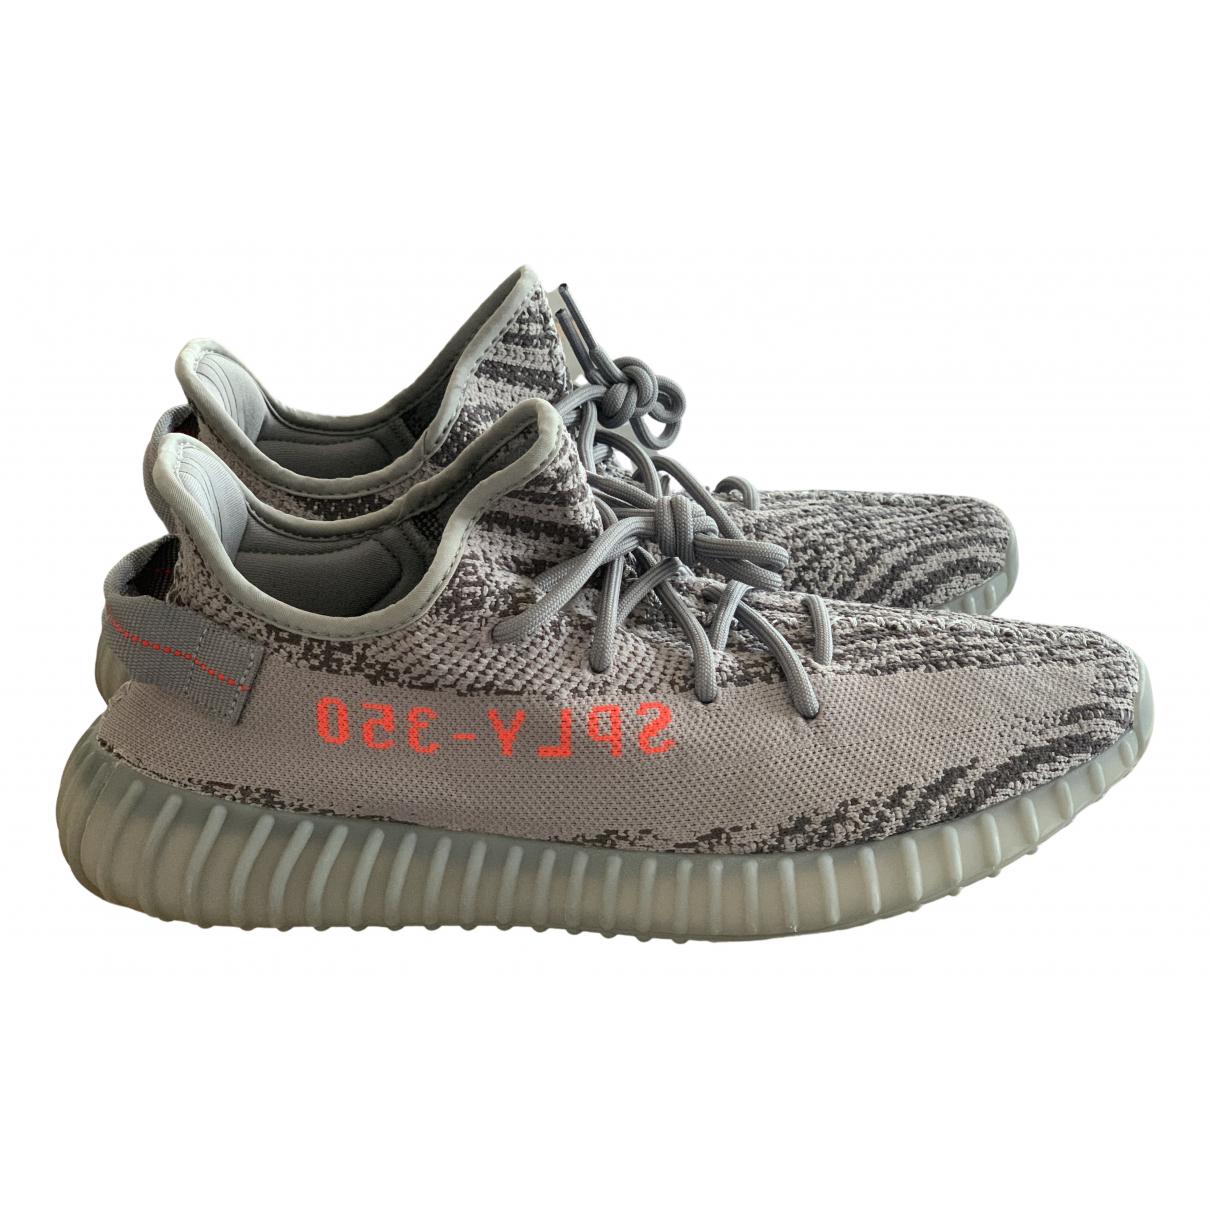 Yeezy X Adidas Boost 350 V2 Sneakers in  Grau Leinen